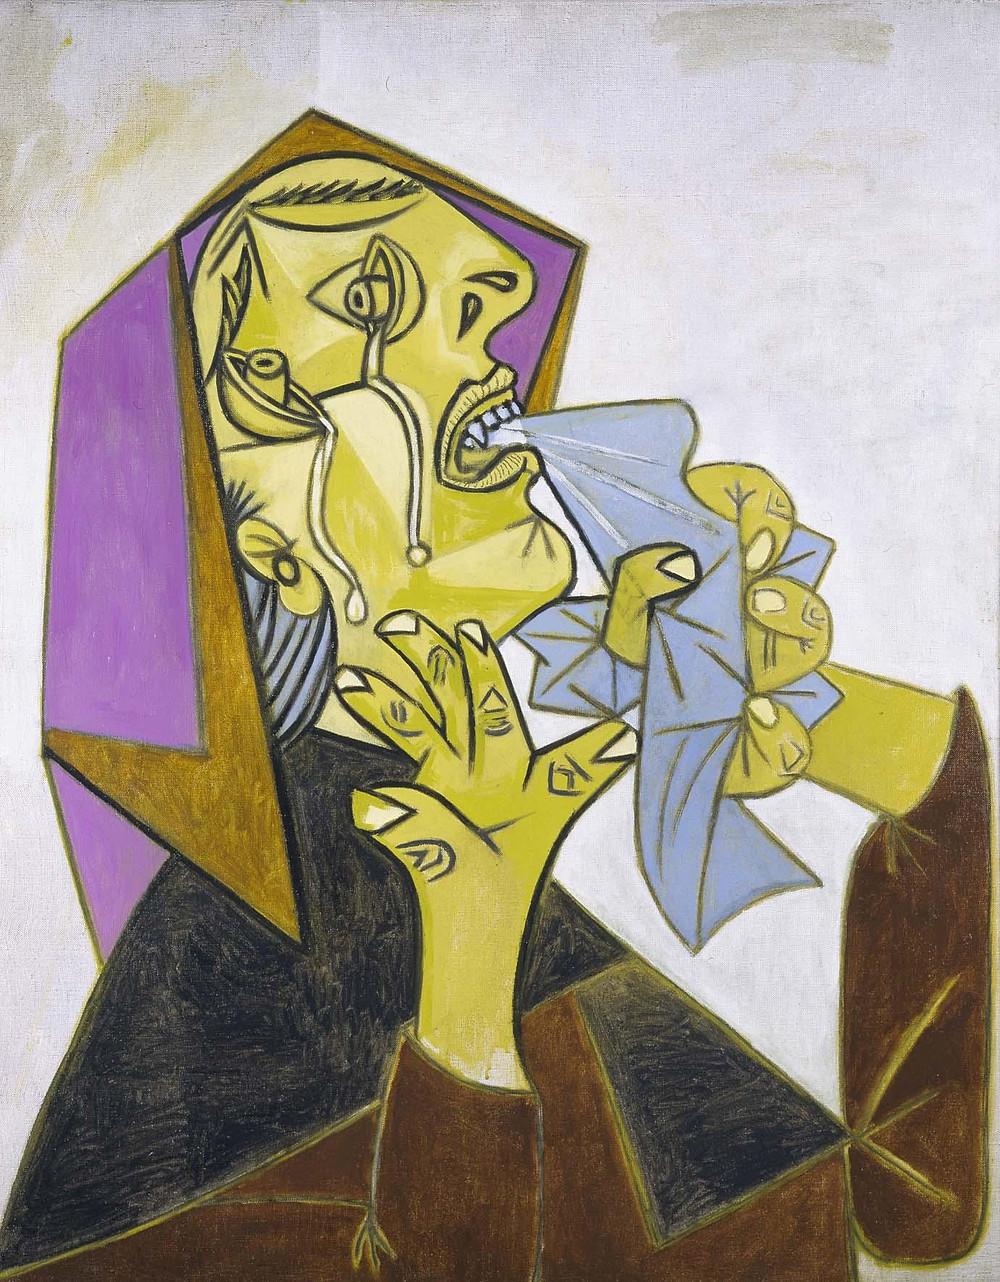 Pablo Picasso, Weeping Woman's Head with Handkerchief [III]. Postscript of Guernica, 1937